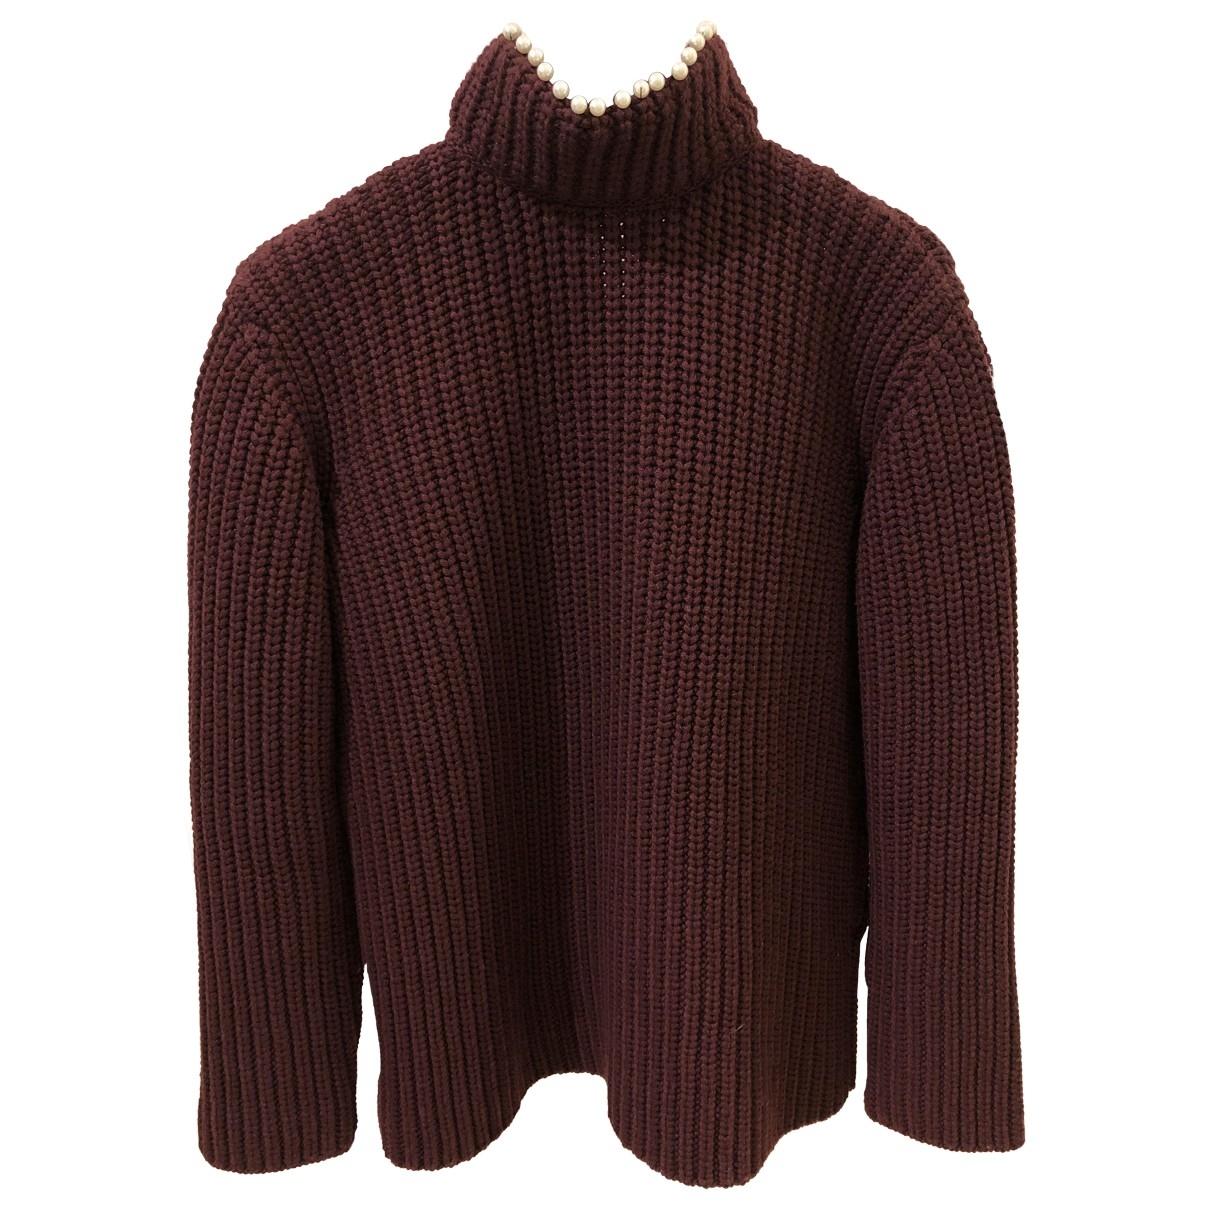 Loewe \N Burgundy Cashmere Knitwear for Women S International